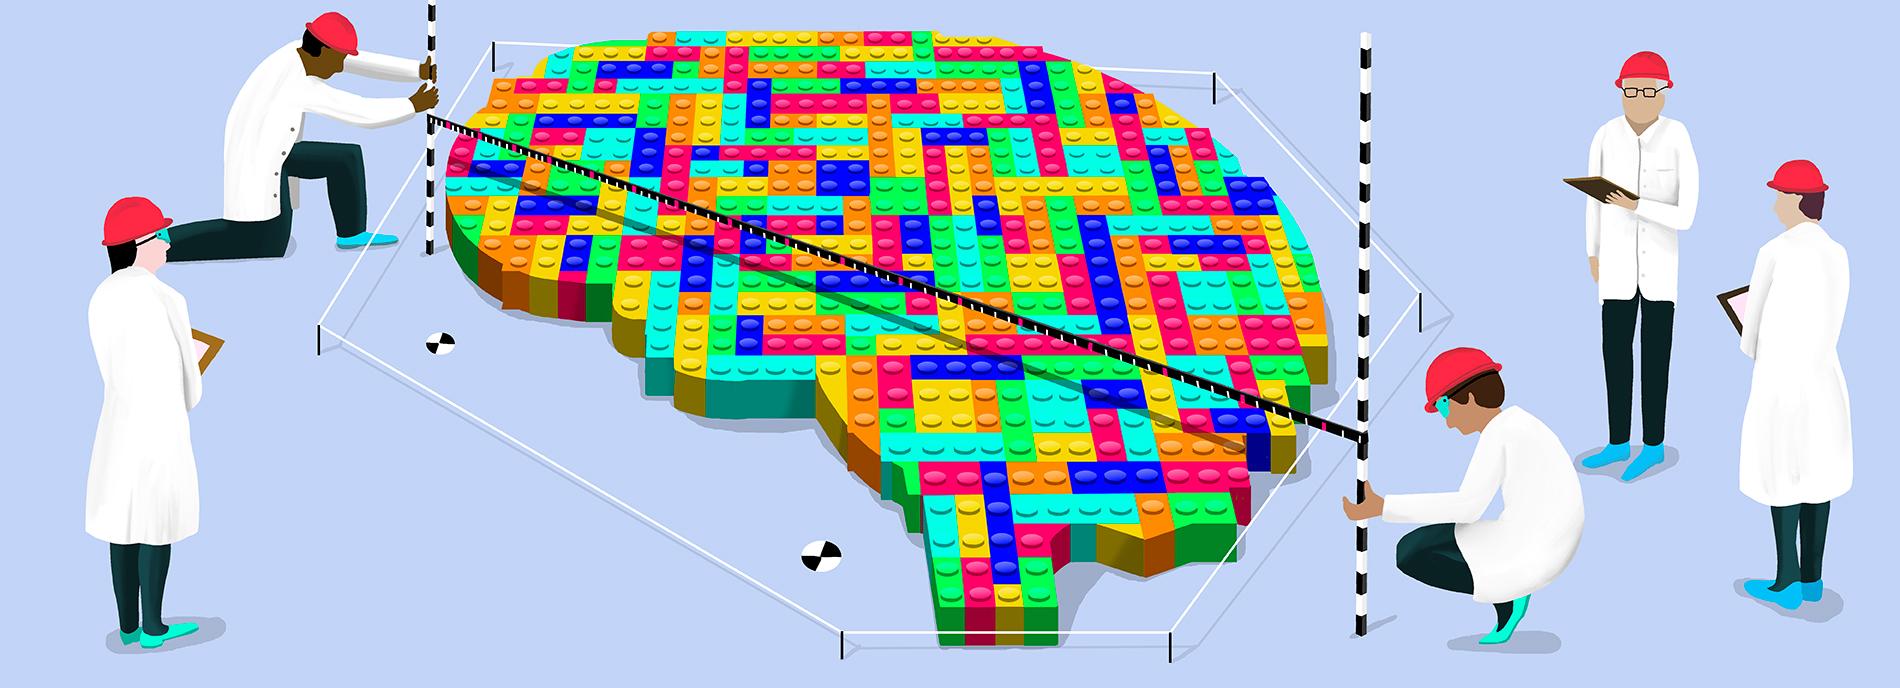 researchers are measuring a big lego brain